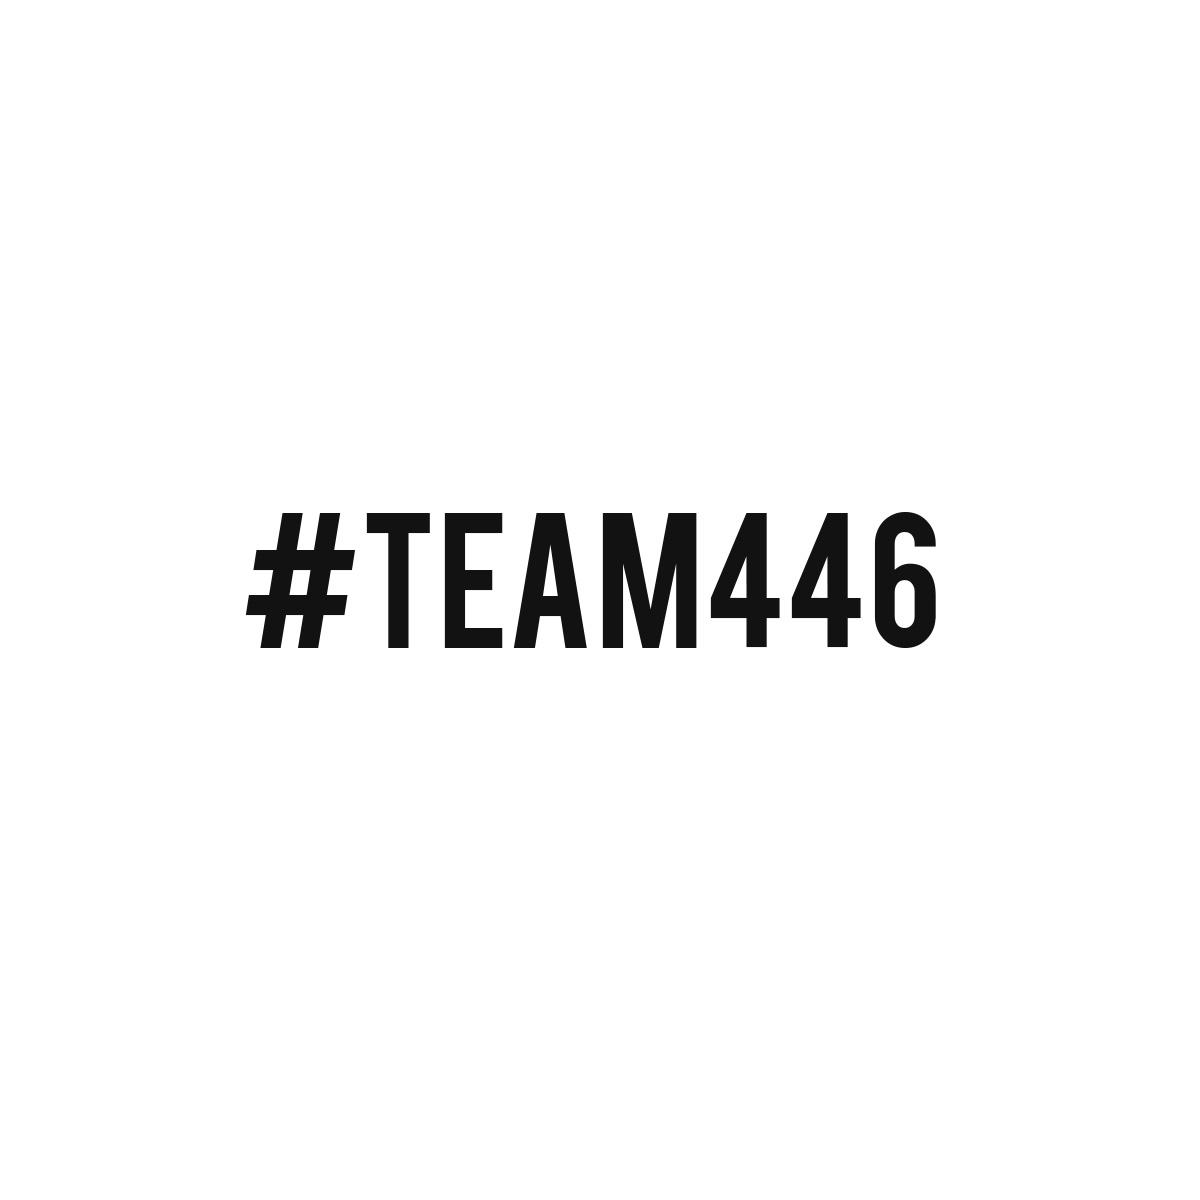 #Team446